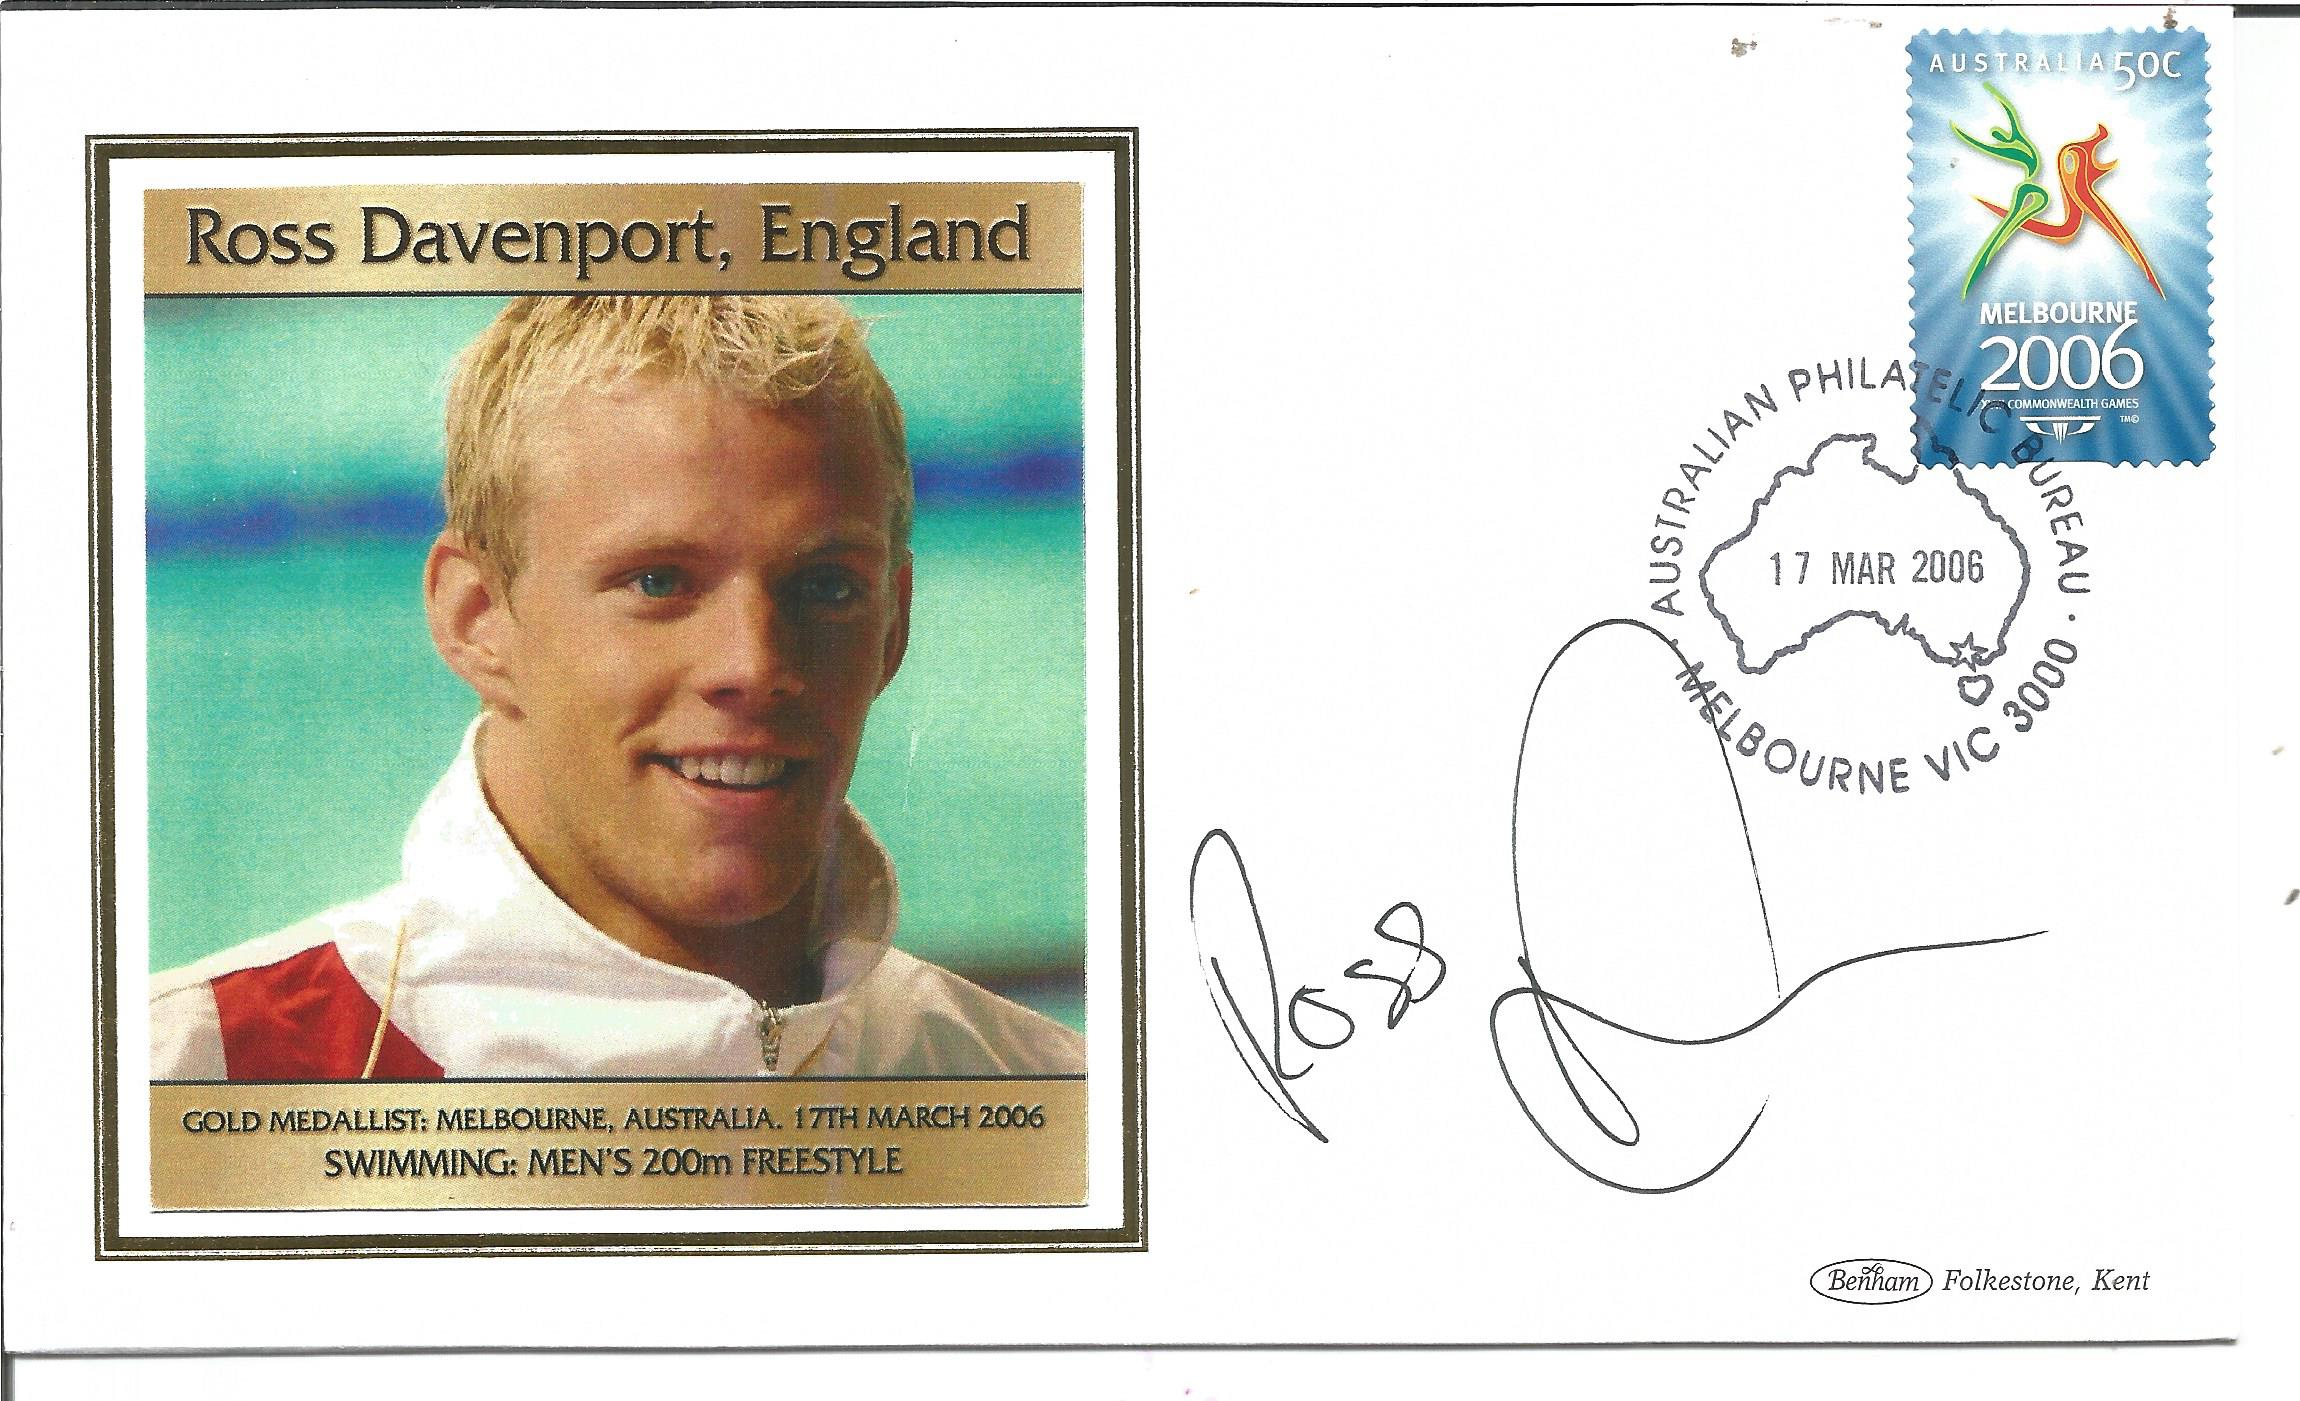 Olympic medal winner Ross Davenport signed Benham Melbourne Olympics silk FDC to commemorate the